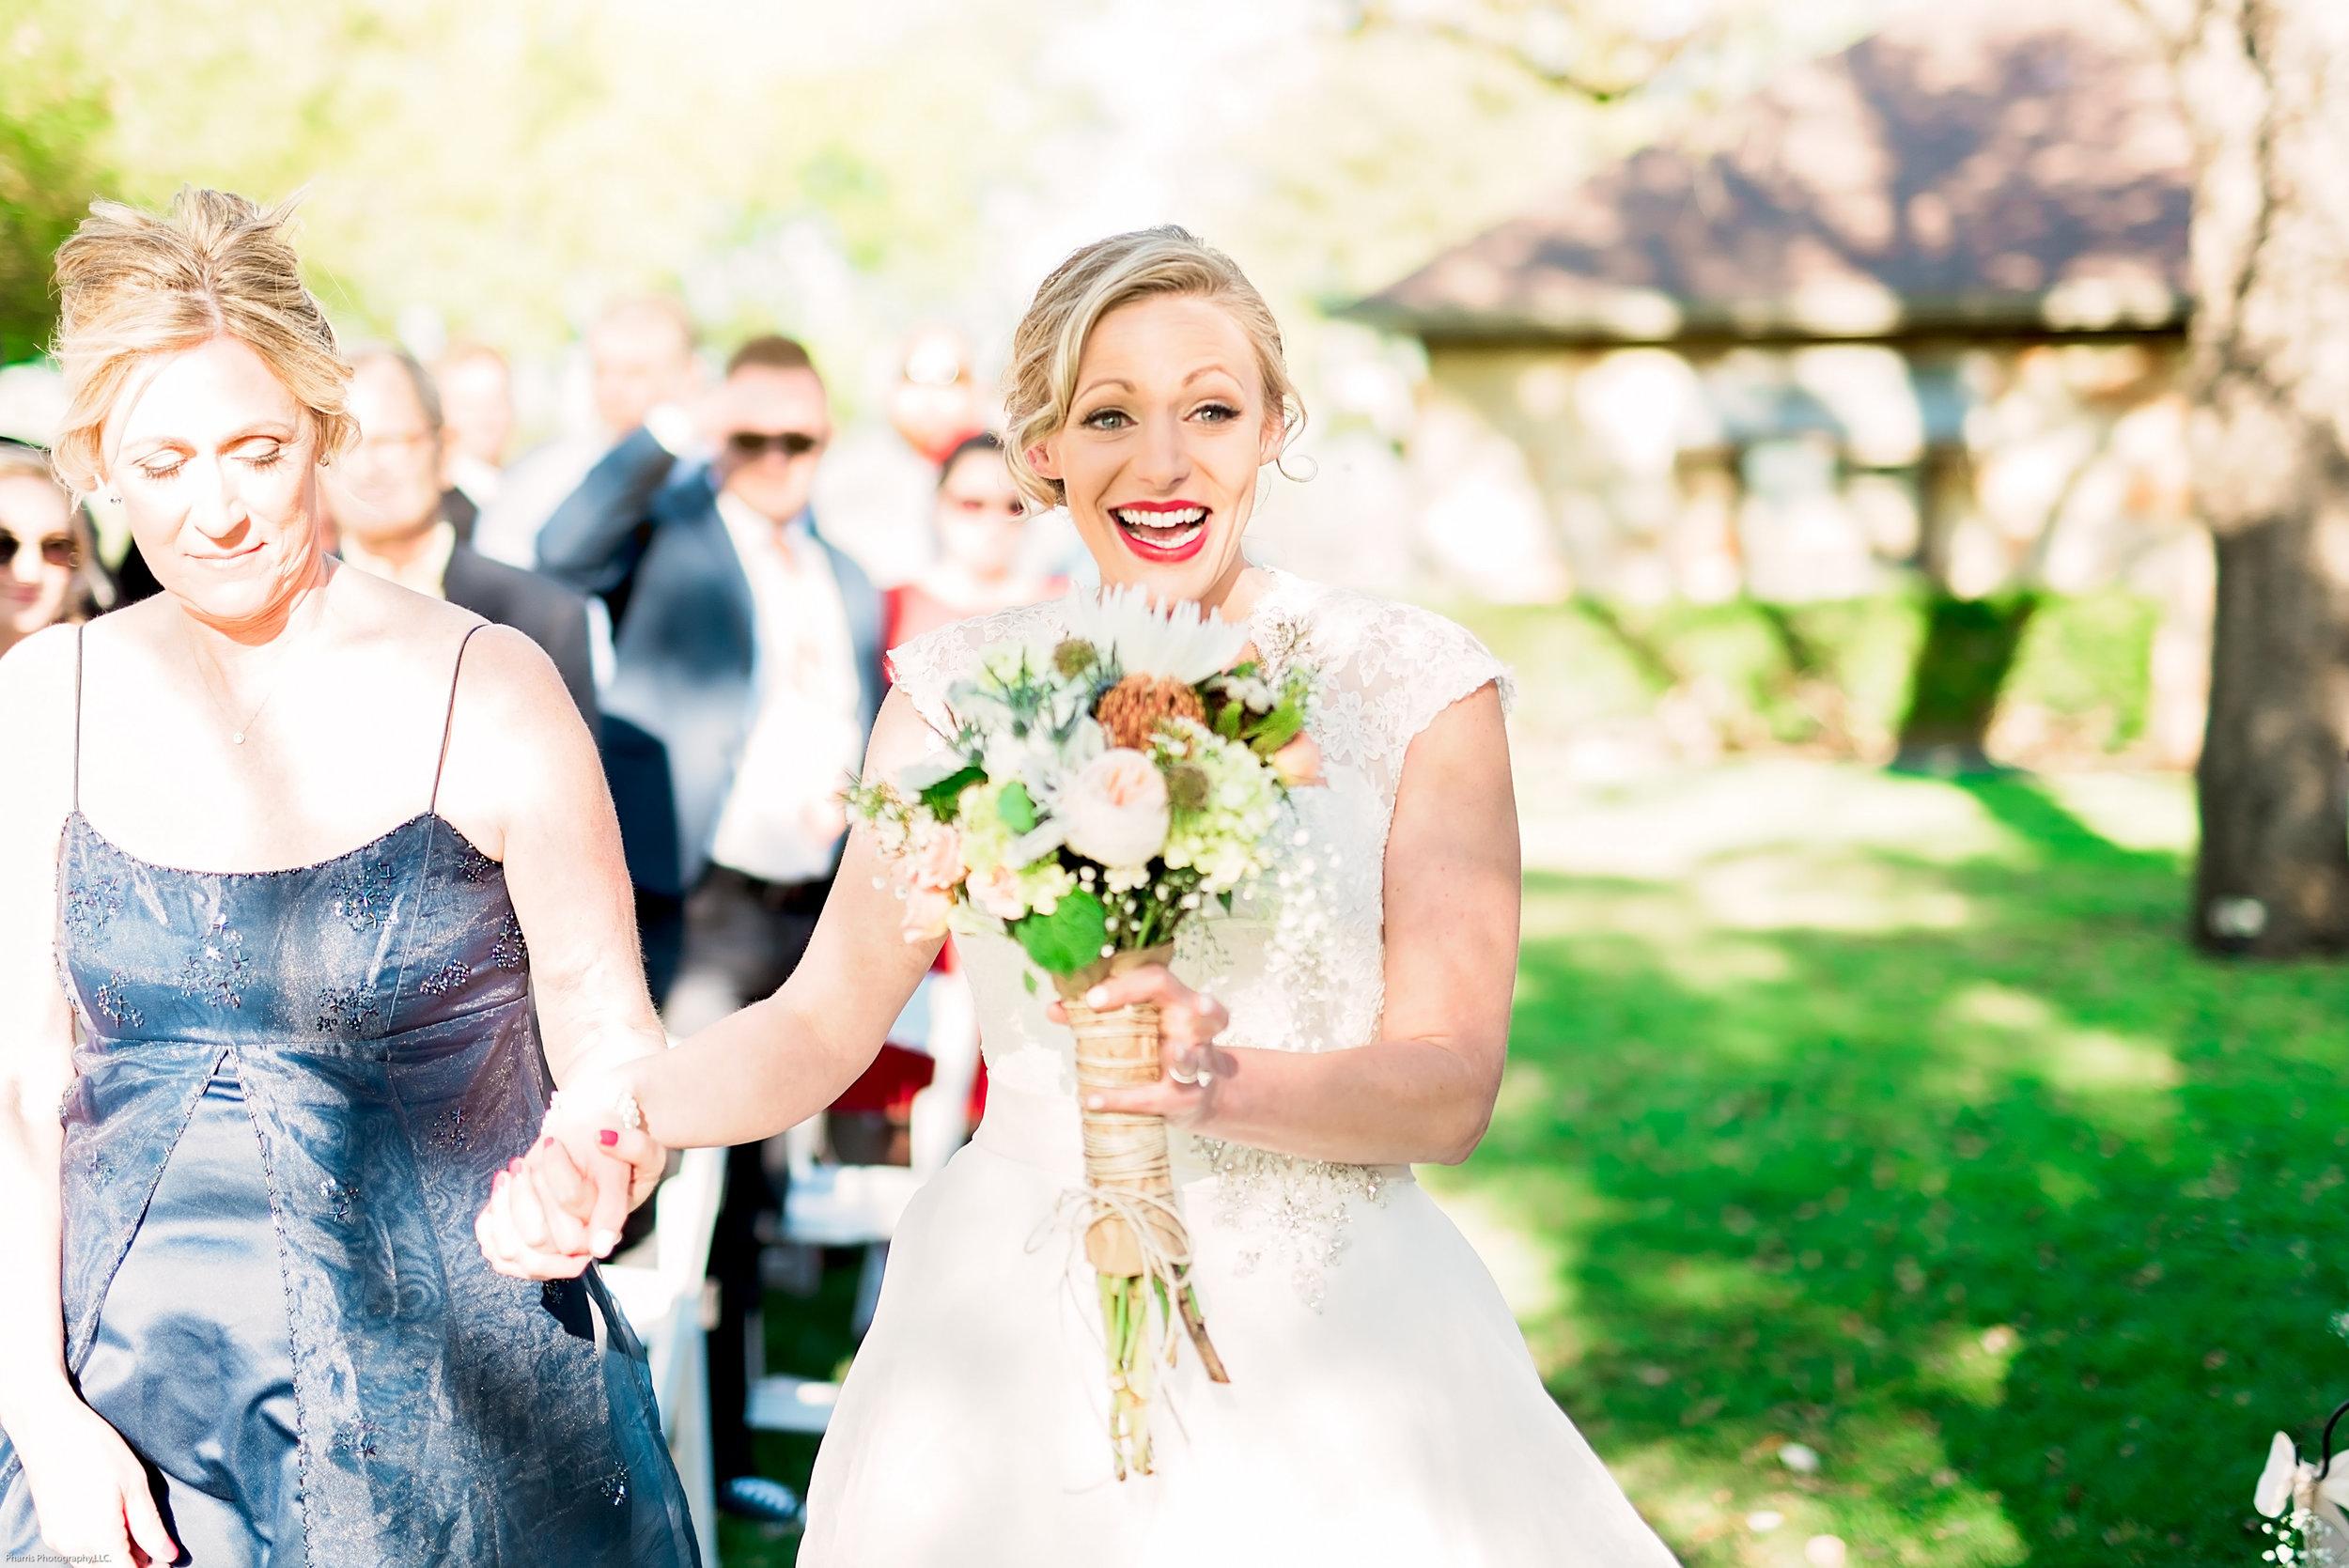 Taylor-Mallorie-Wedding-Pharris-Photos-0053.jpg